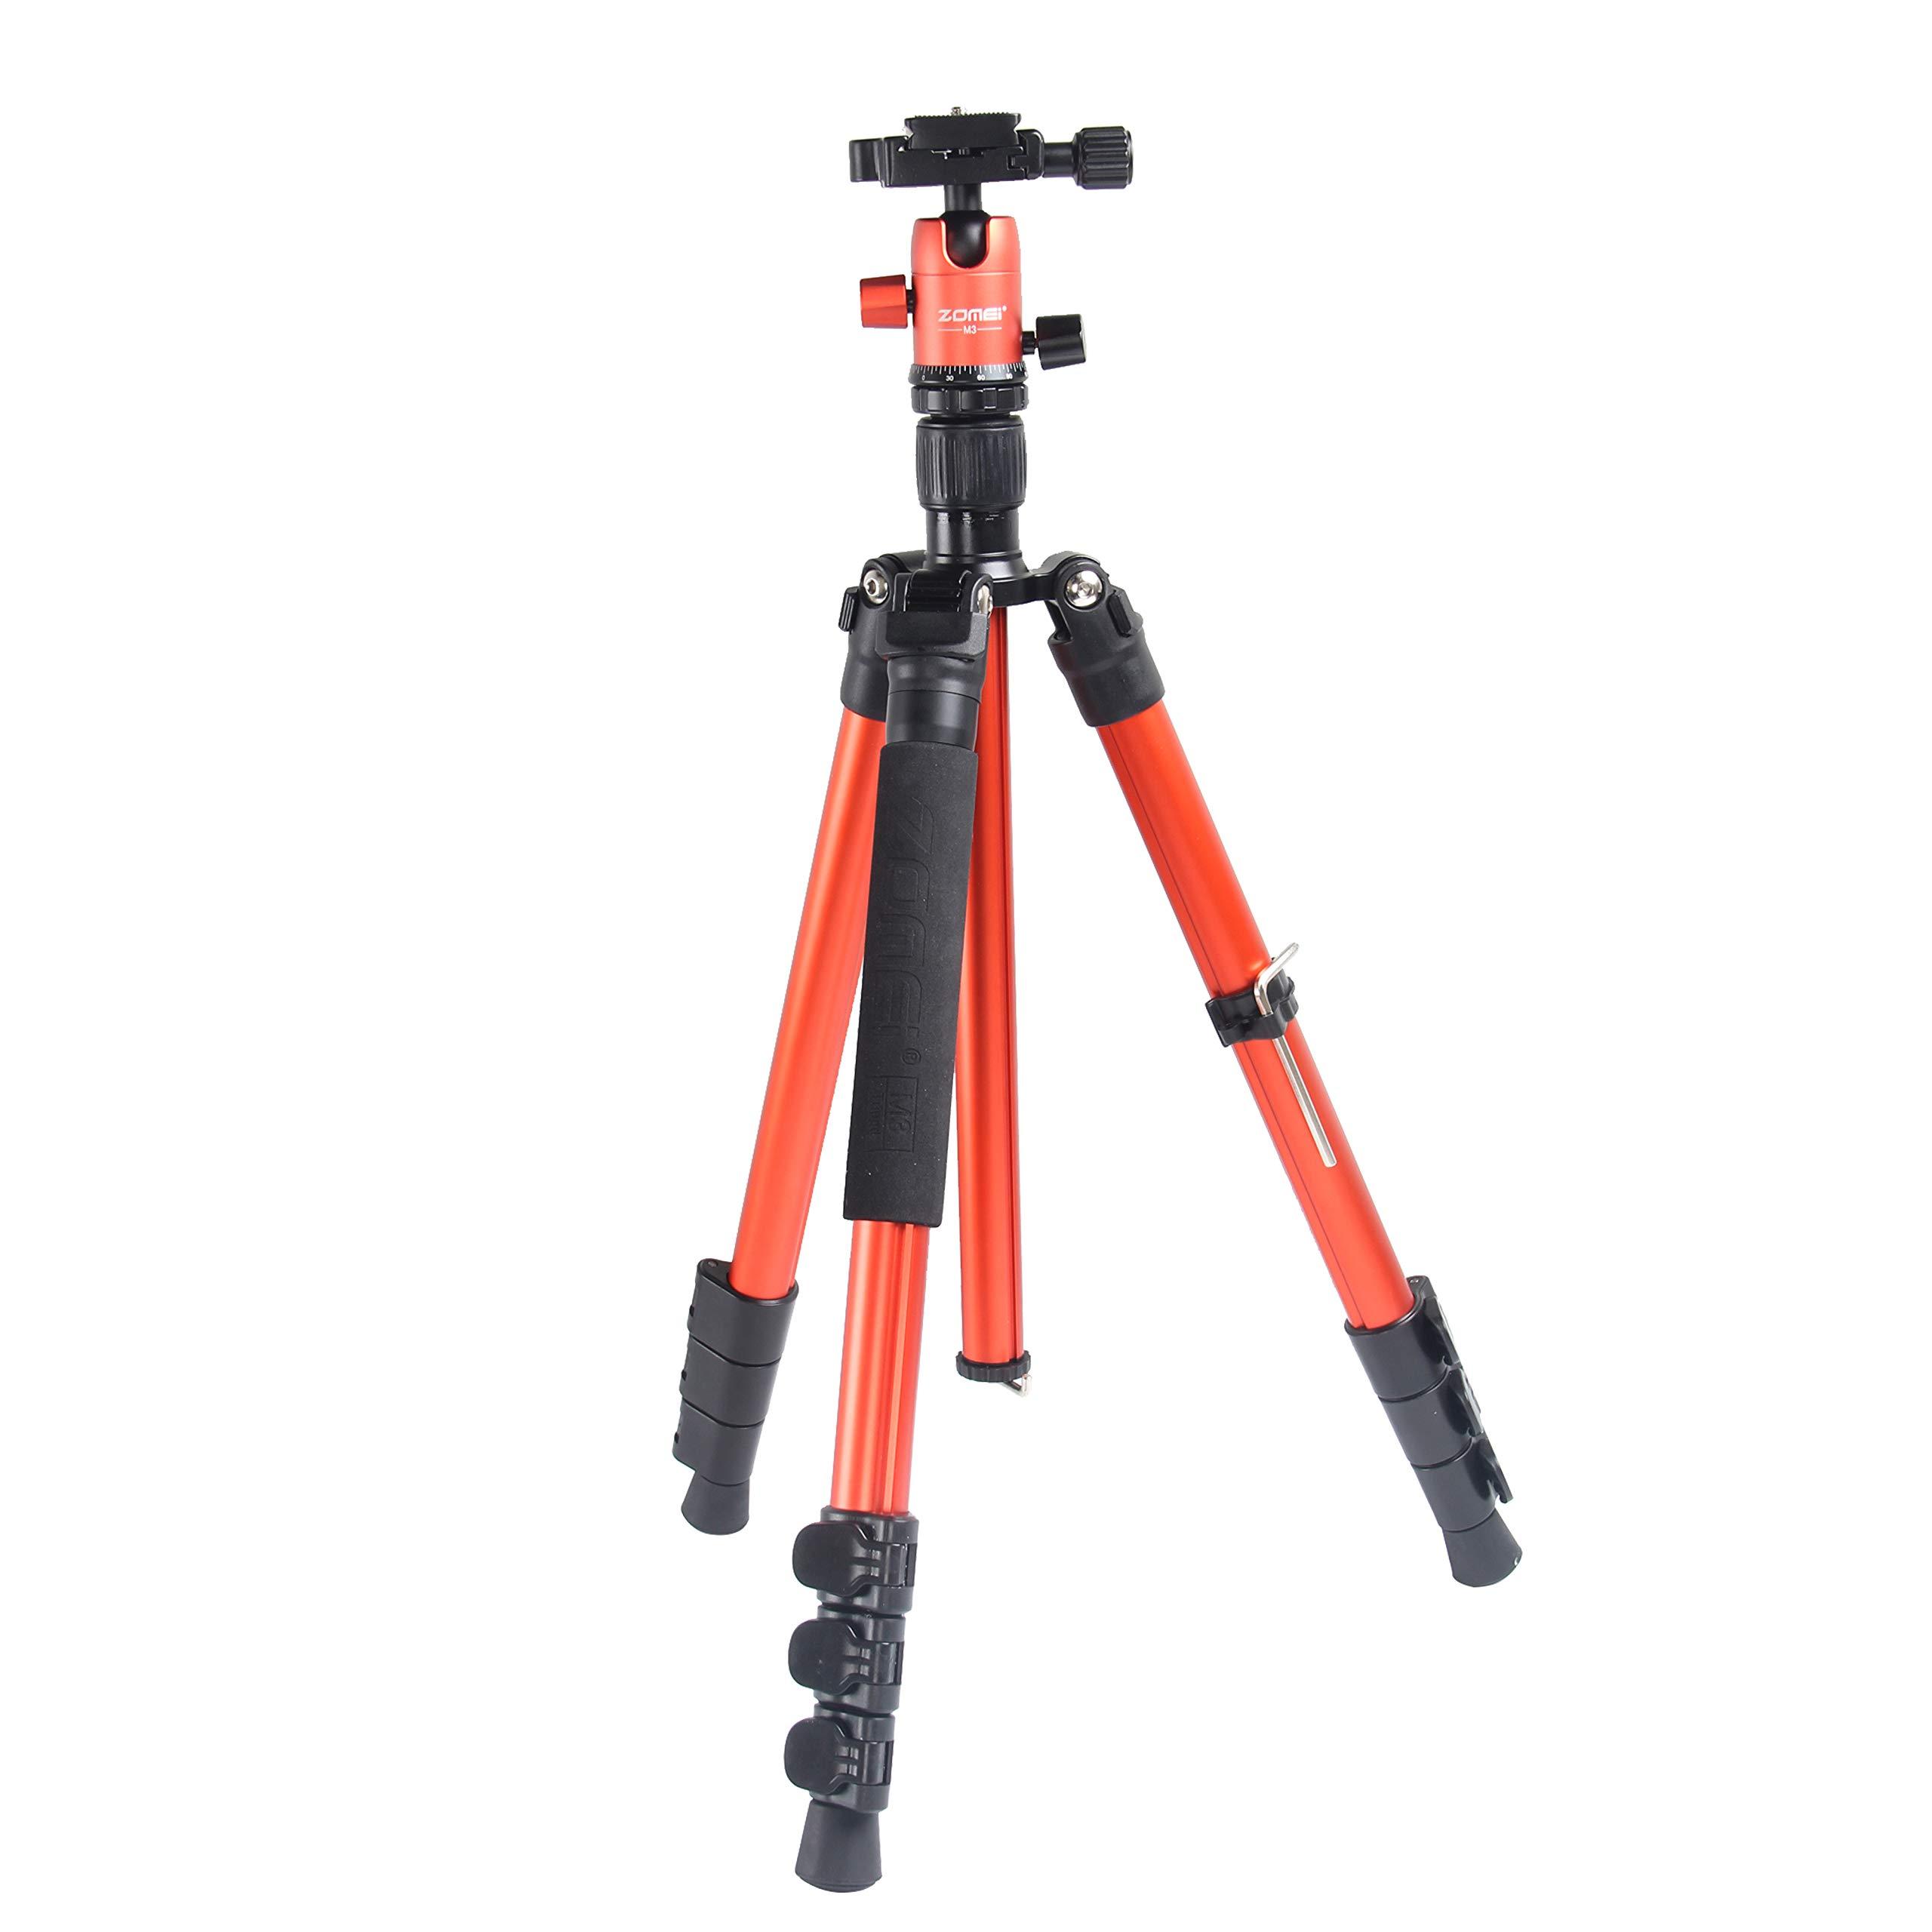 Zomei M3 Travel Camera Aluminum Tripod Lightweight Professional with 360 Degree Ball Head,1/4\